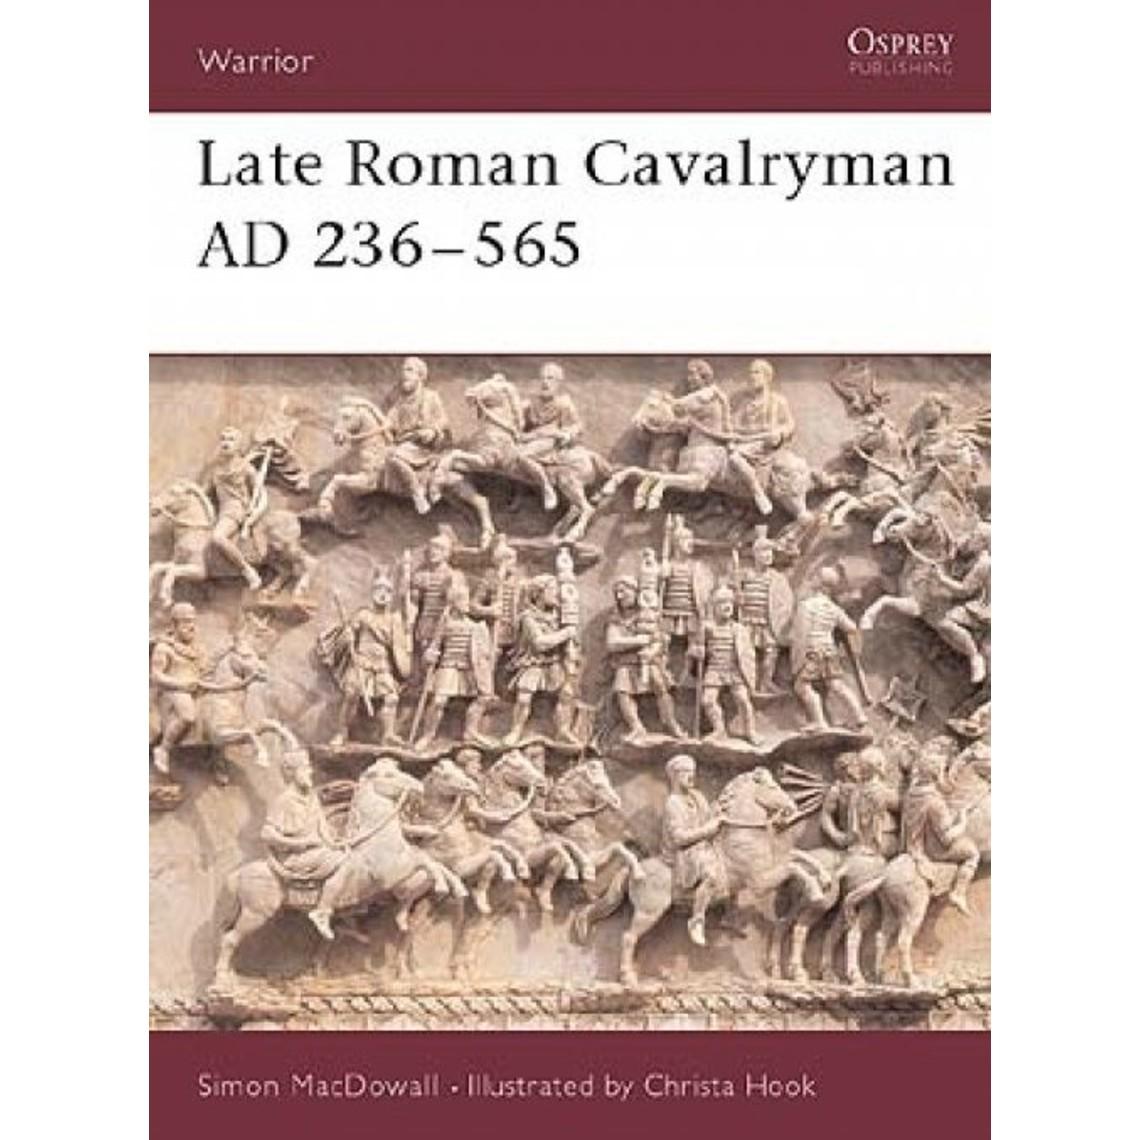 Osprey: époque romaine tardive Cavalier AD 236-565